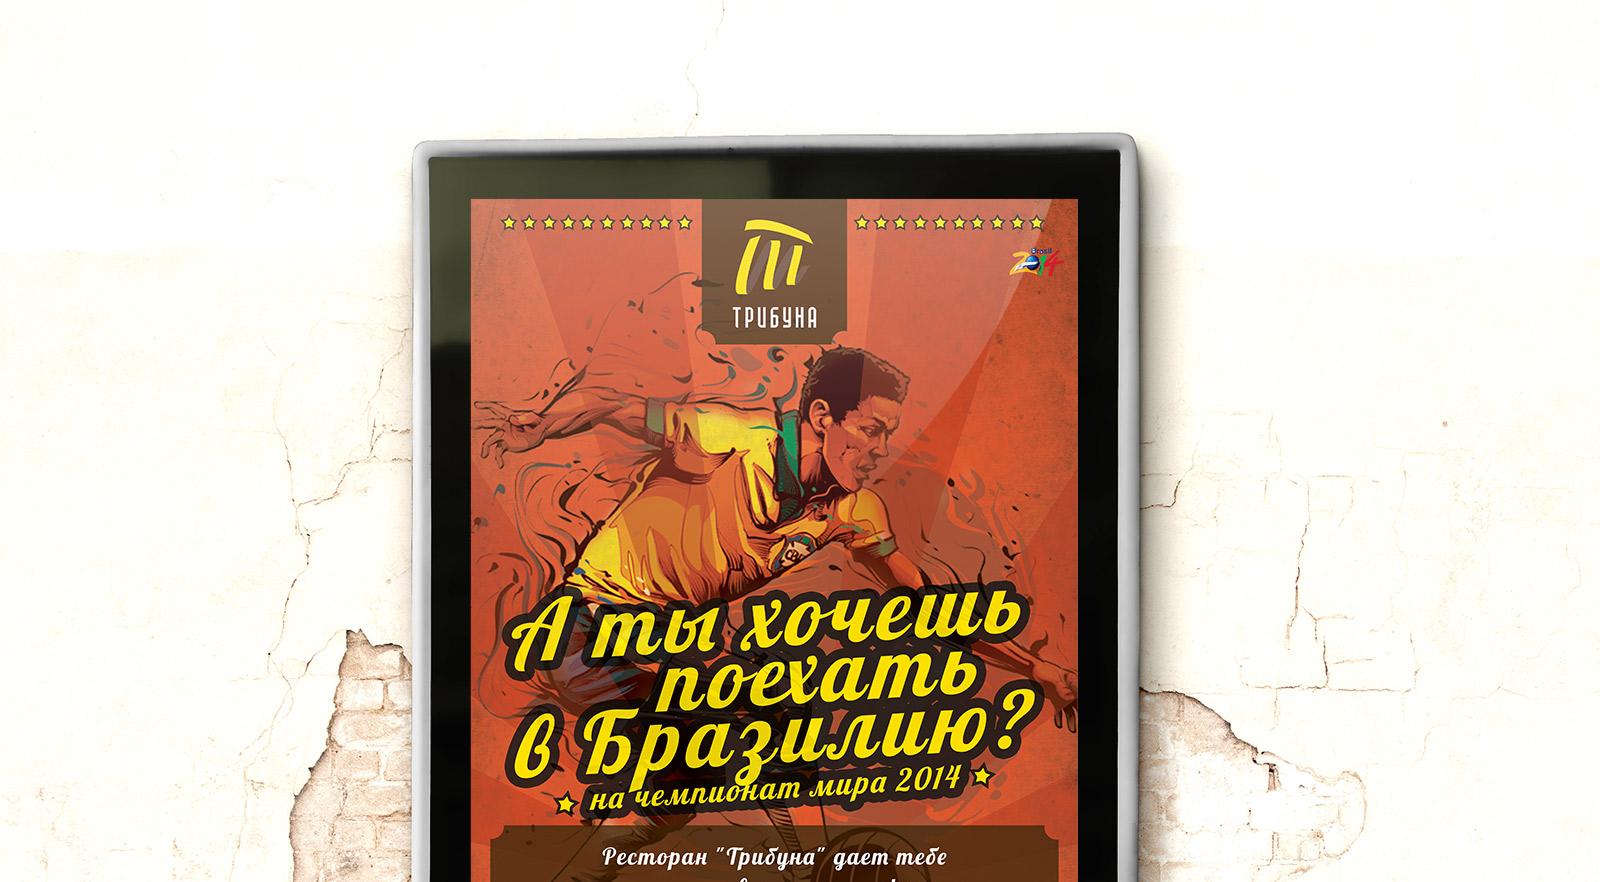 Плакат ресторана Трибуна